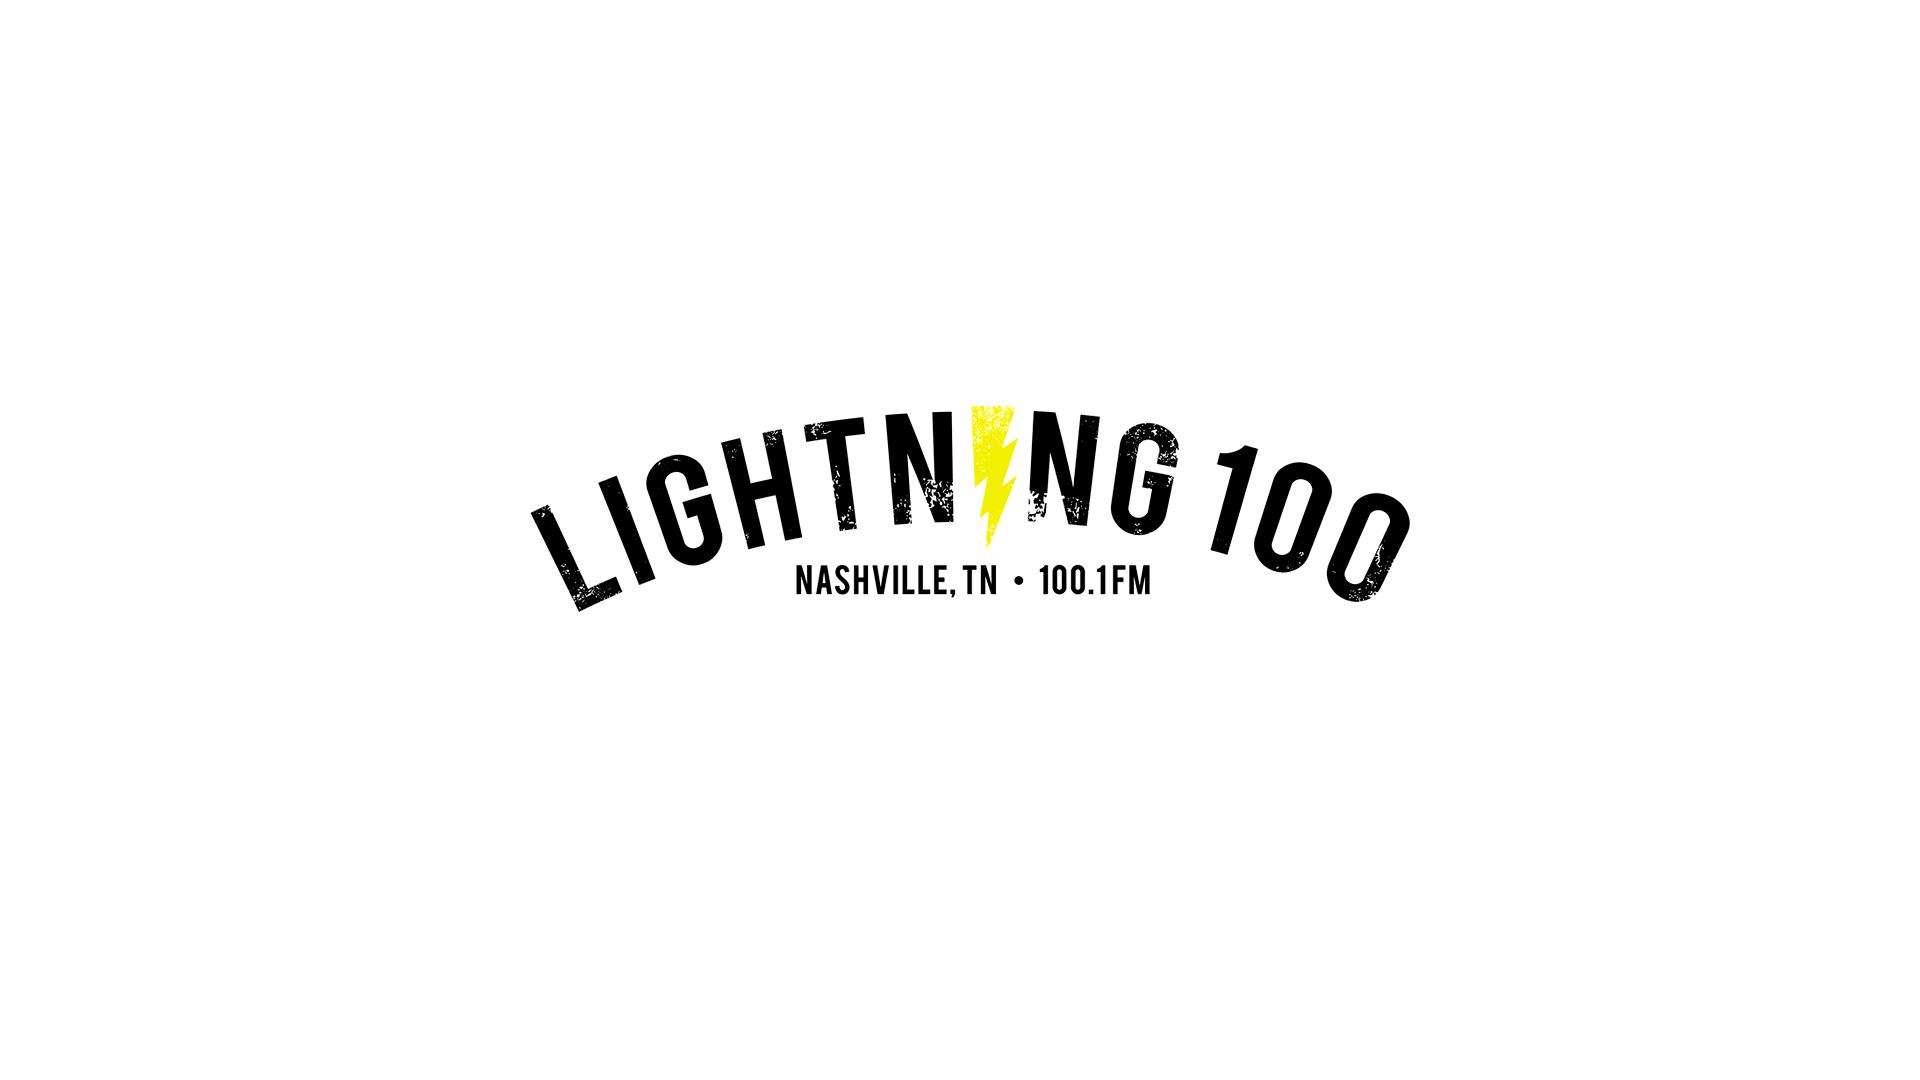 Come Together Create - Jonathan Pears - Lightning100.jpg